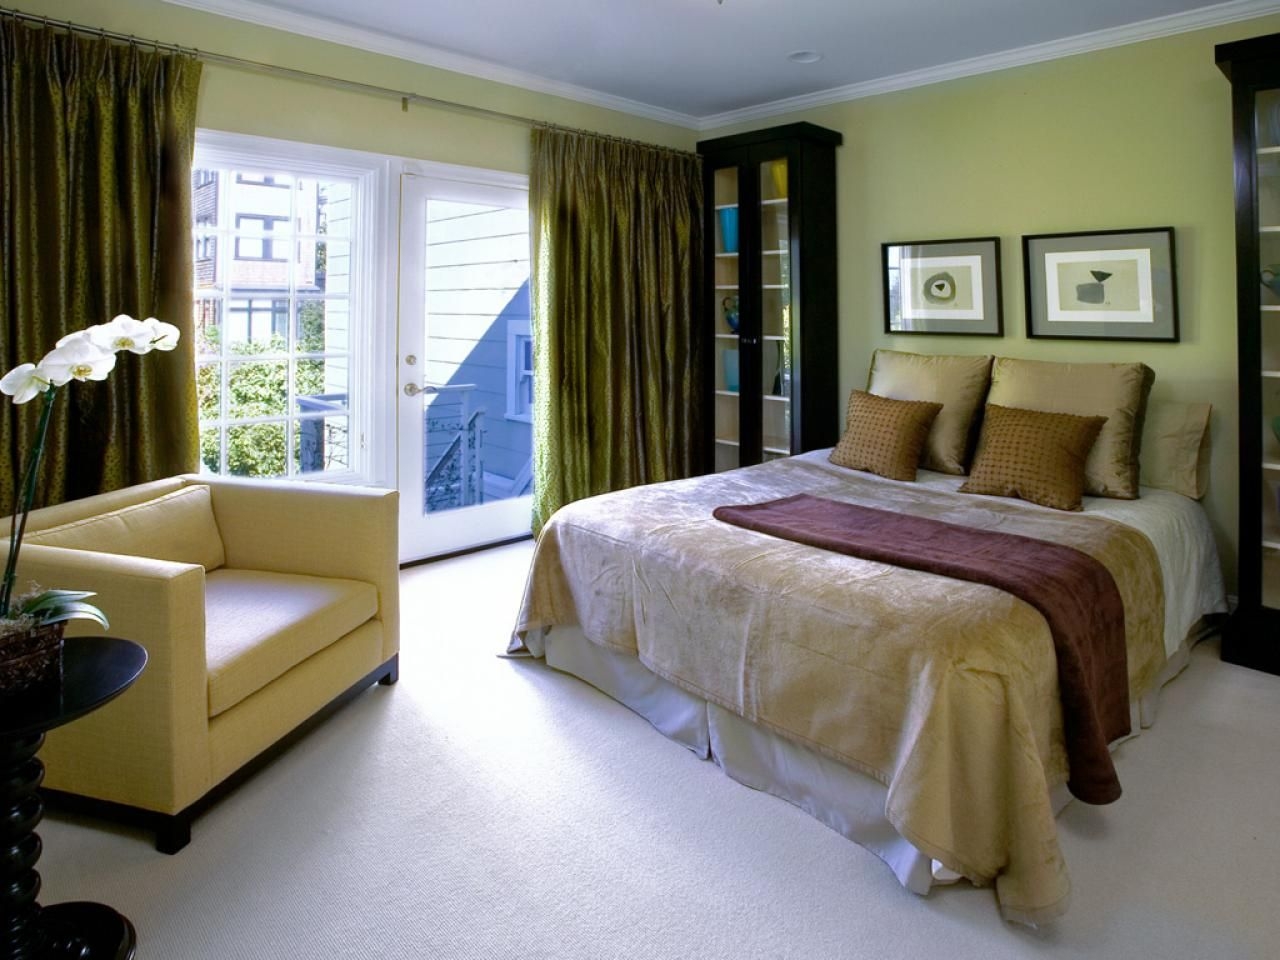 Good Bedroom Color Schemes Pictures Options Ideas Best